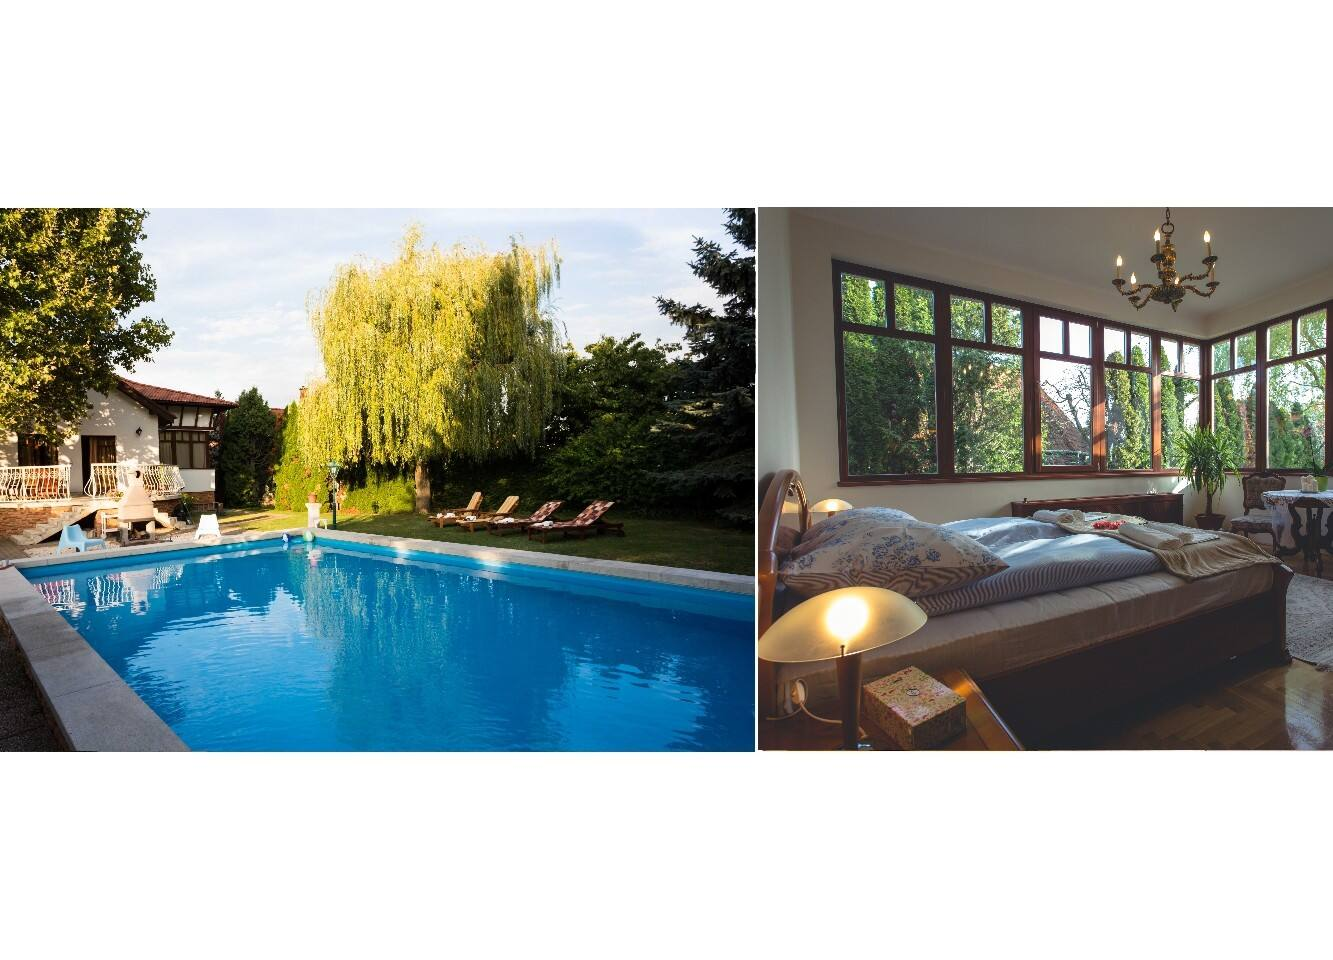 swimming pool & bedroom